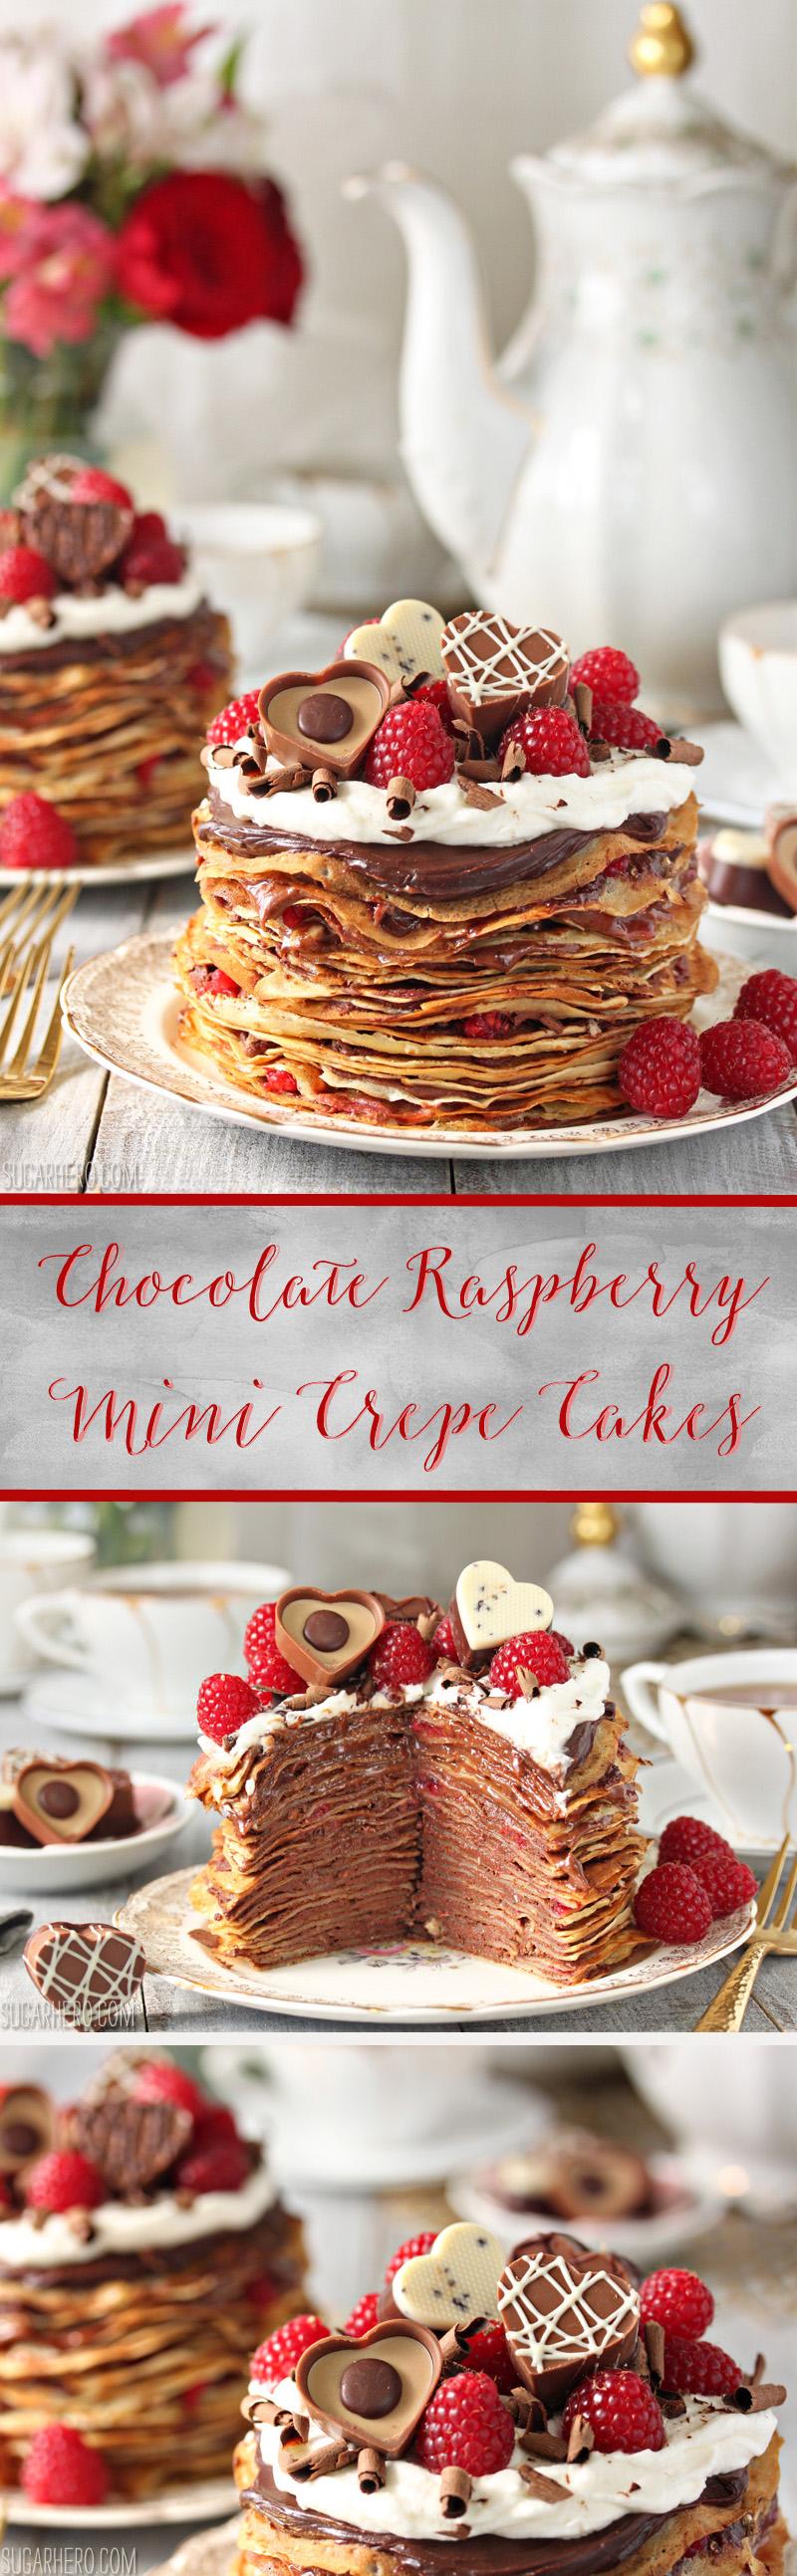 Chocolate Raspberry Mini Crepe Cakes - gorgeous mini cakes made with crepes, chocolate, and raspberries! | From SugarHero.com